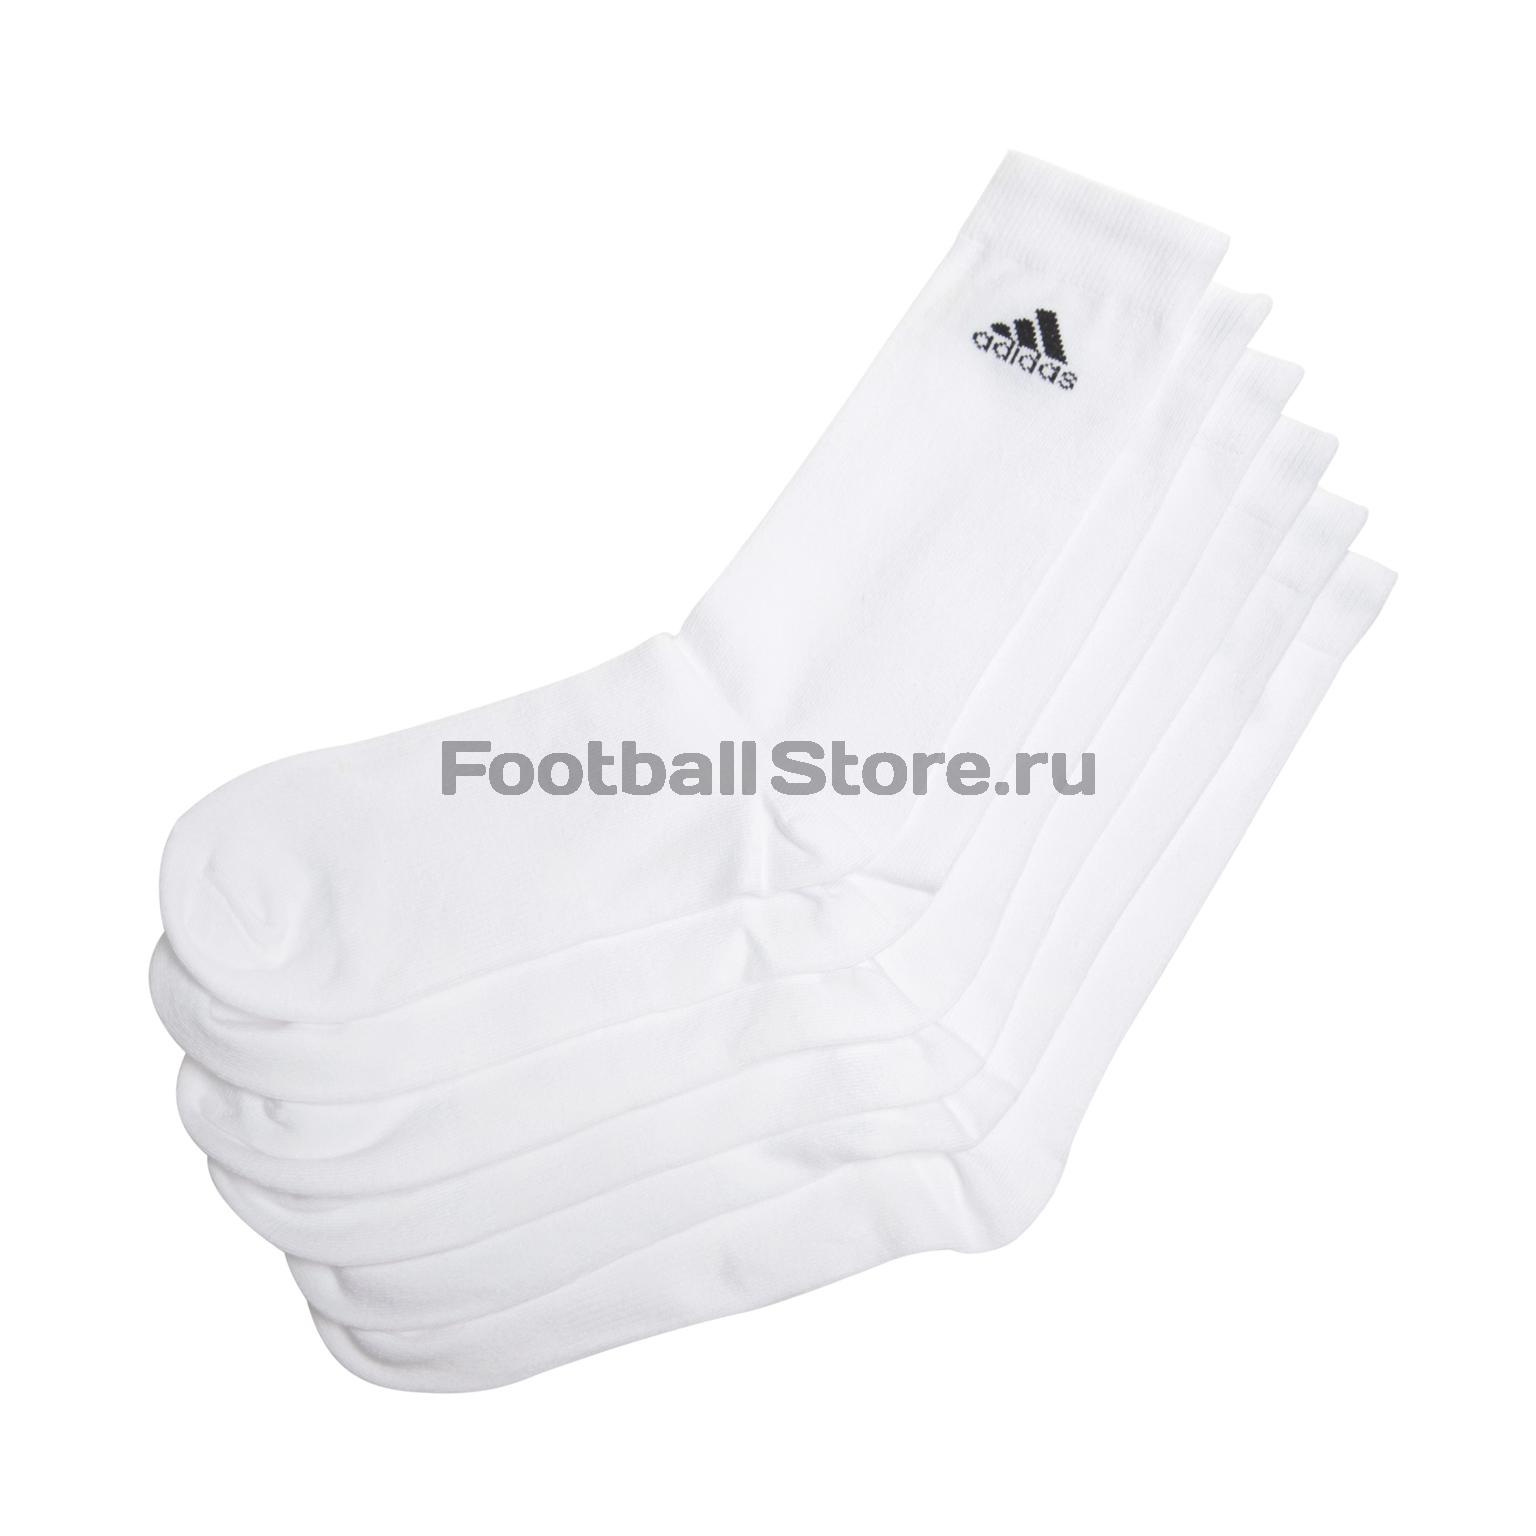 Носки Adidas Комплект носков  Adidas Per T Crew 3PP AA2329